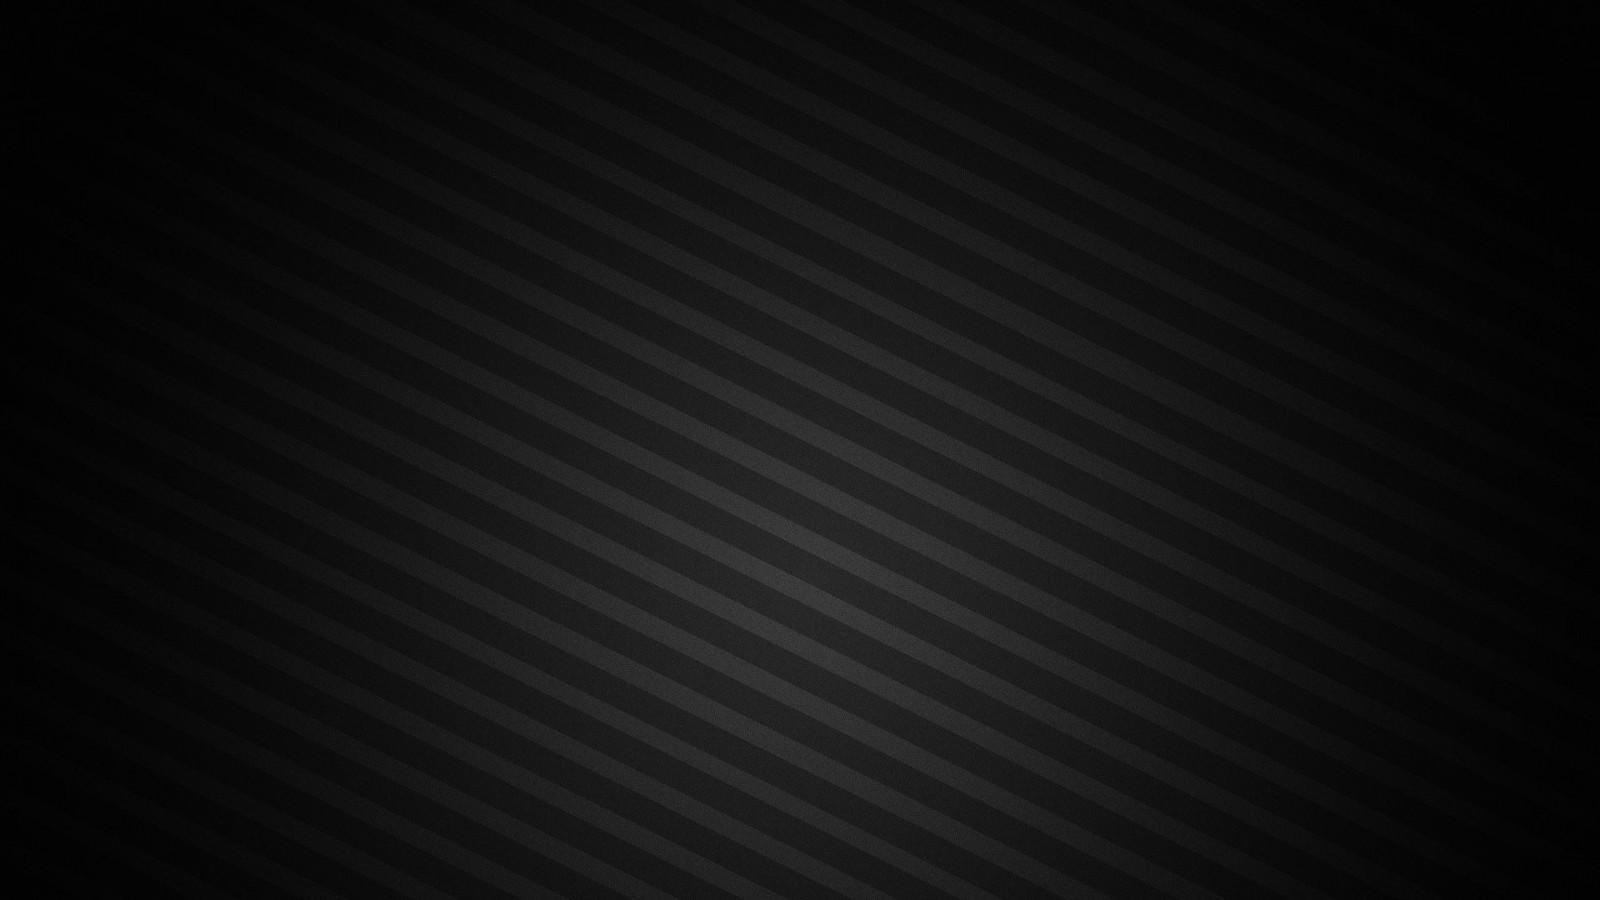 Wallpaper : black background, text, pattern, texture ...